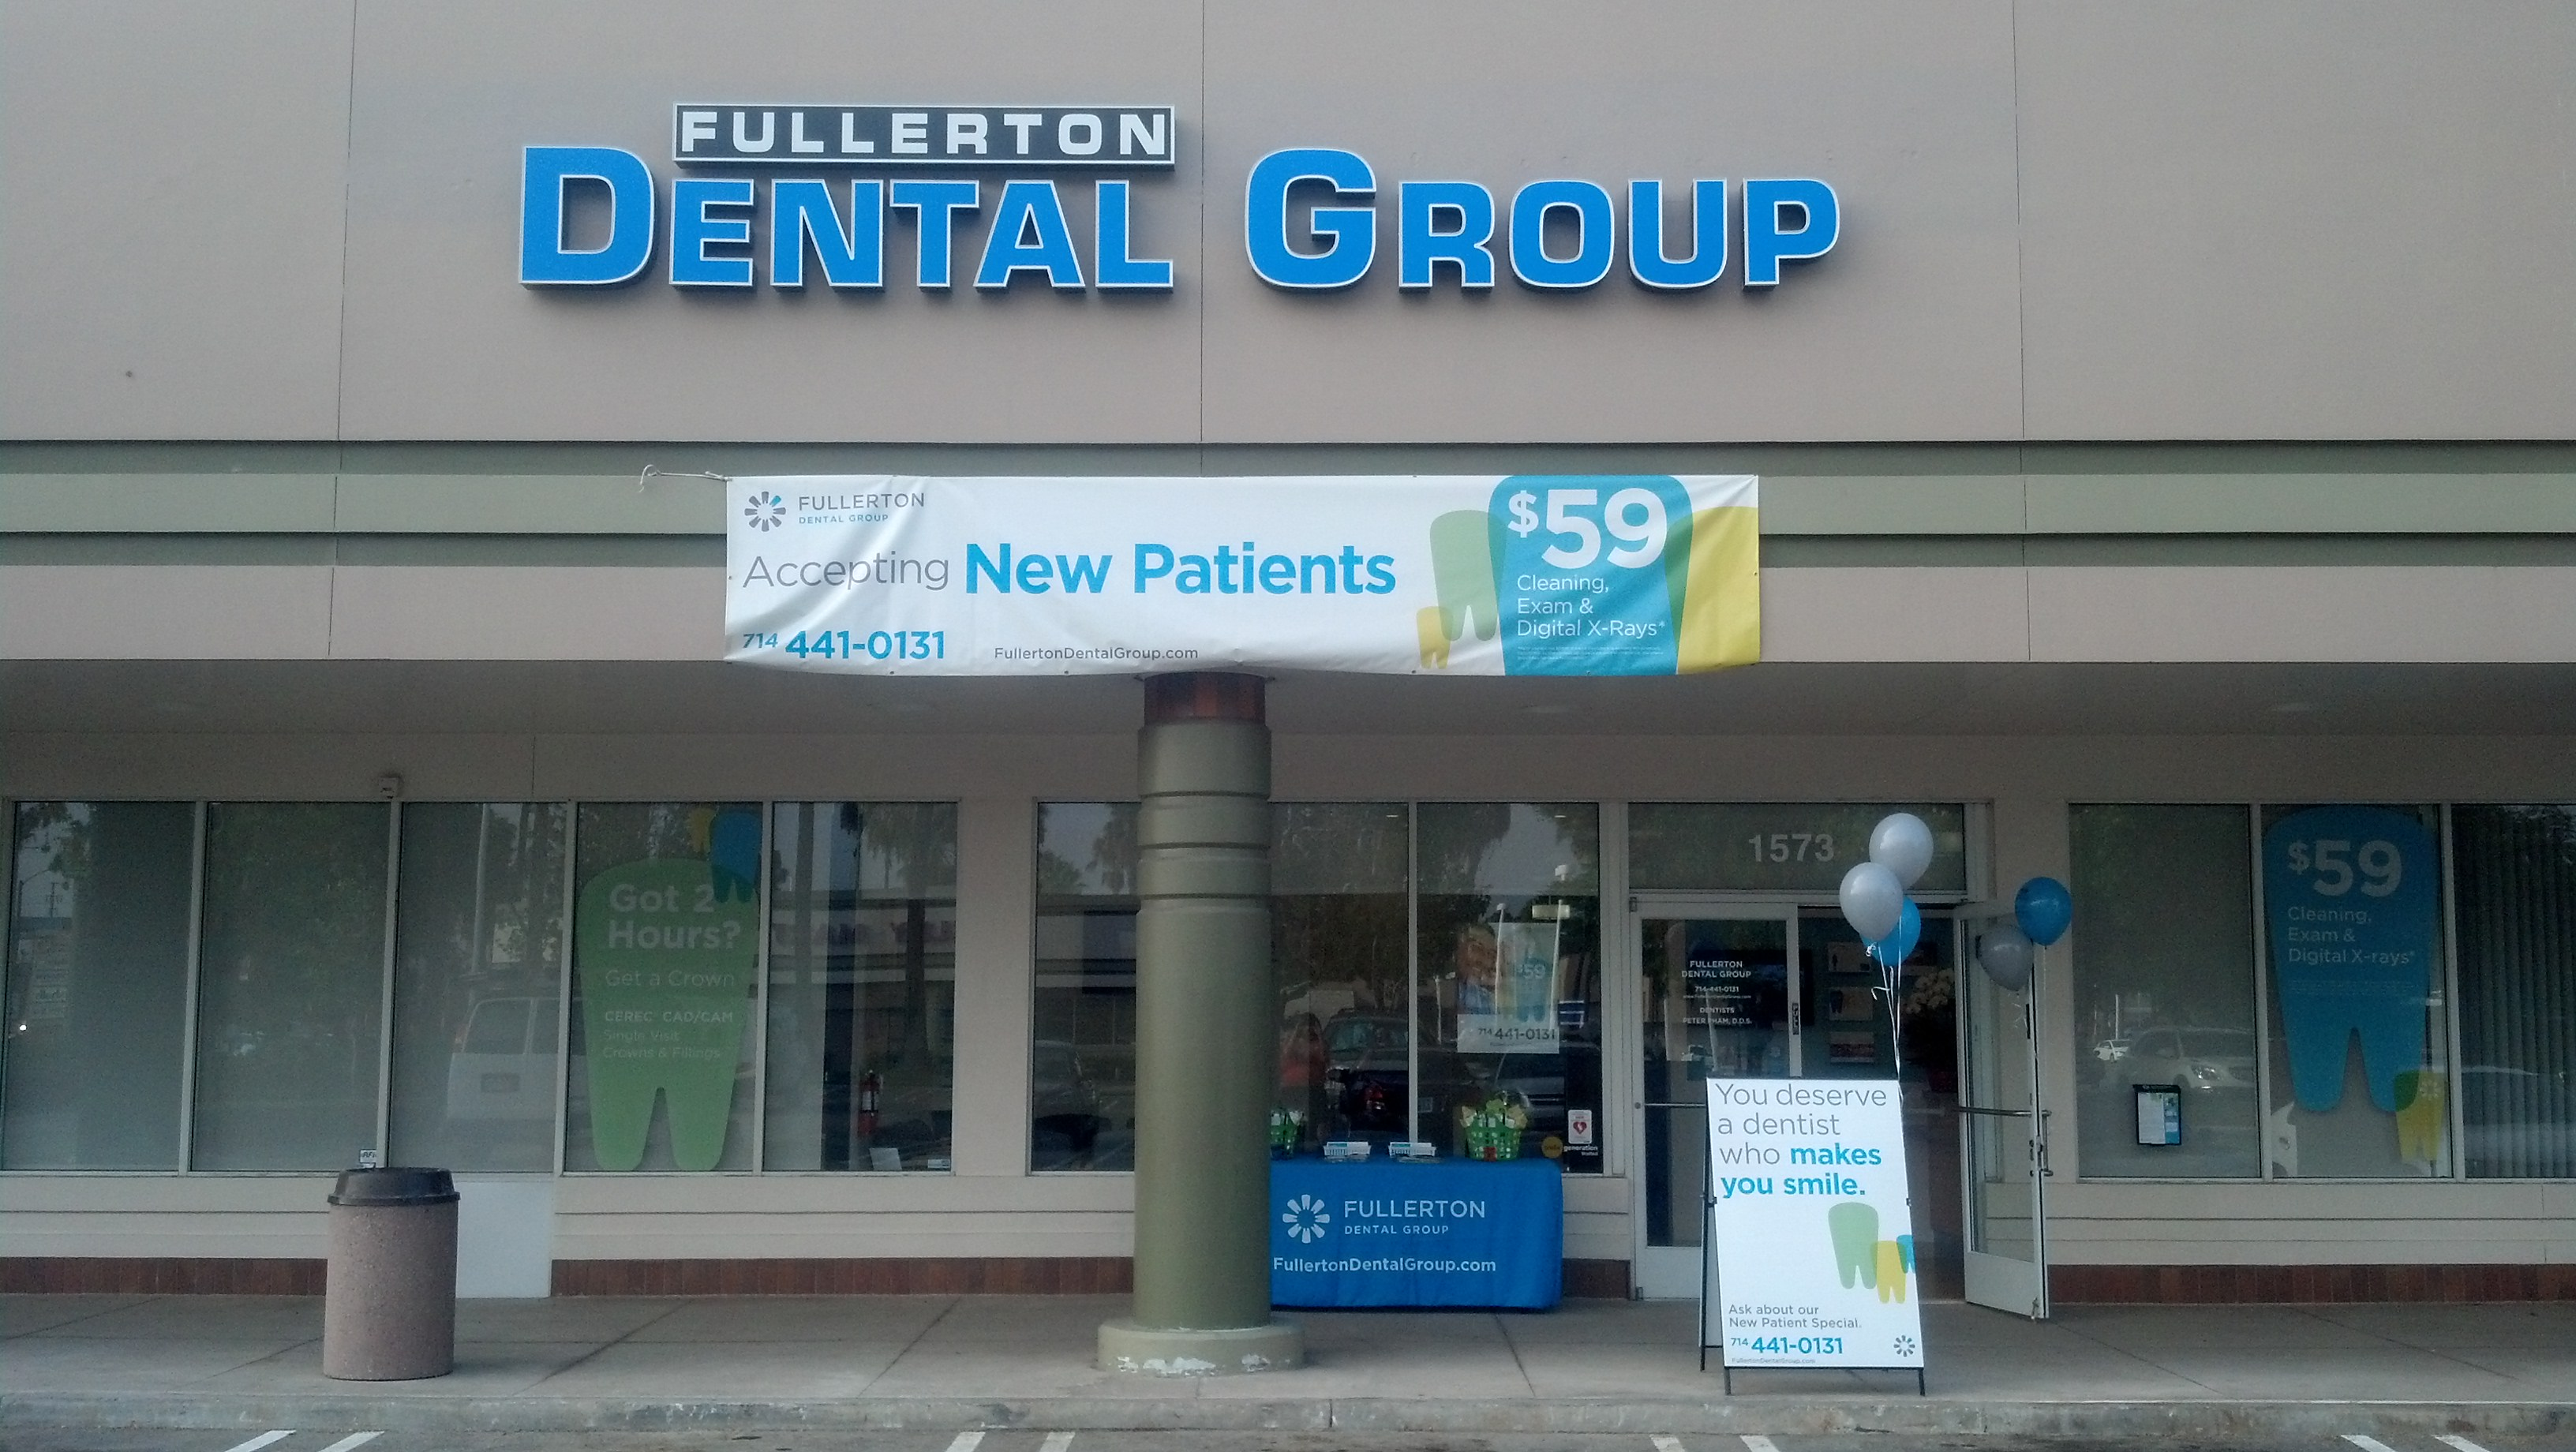 Fullerton Dental Group image 15